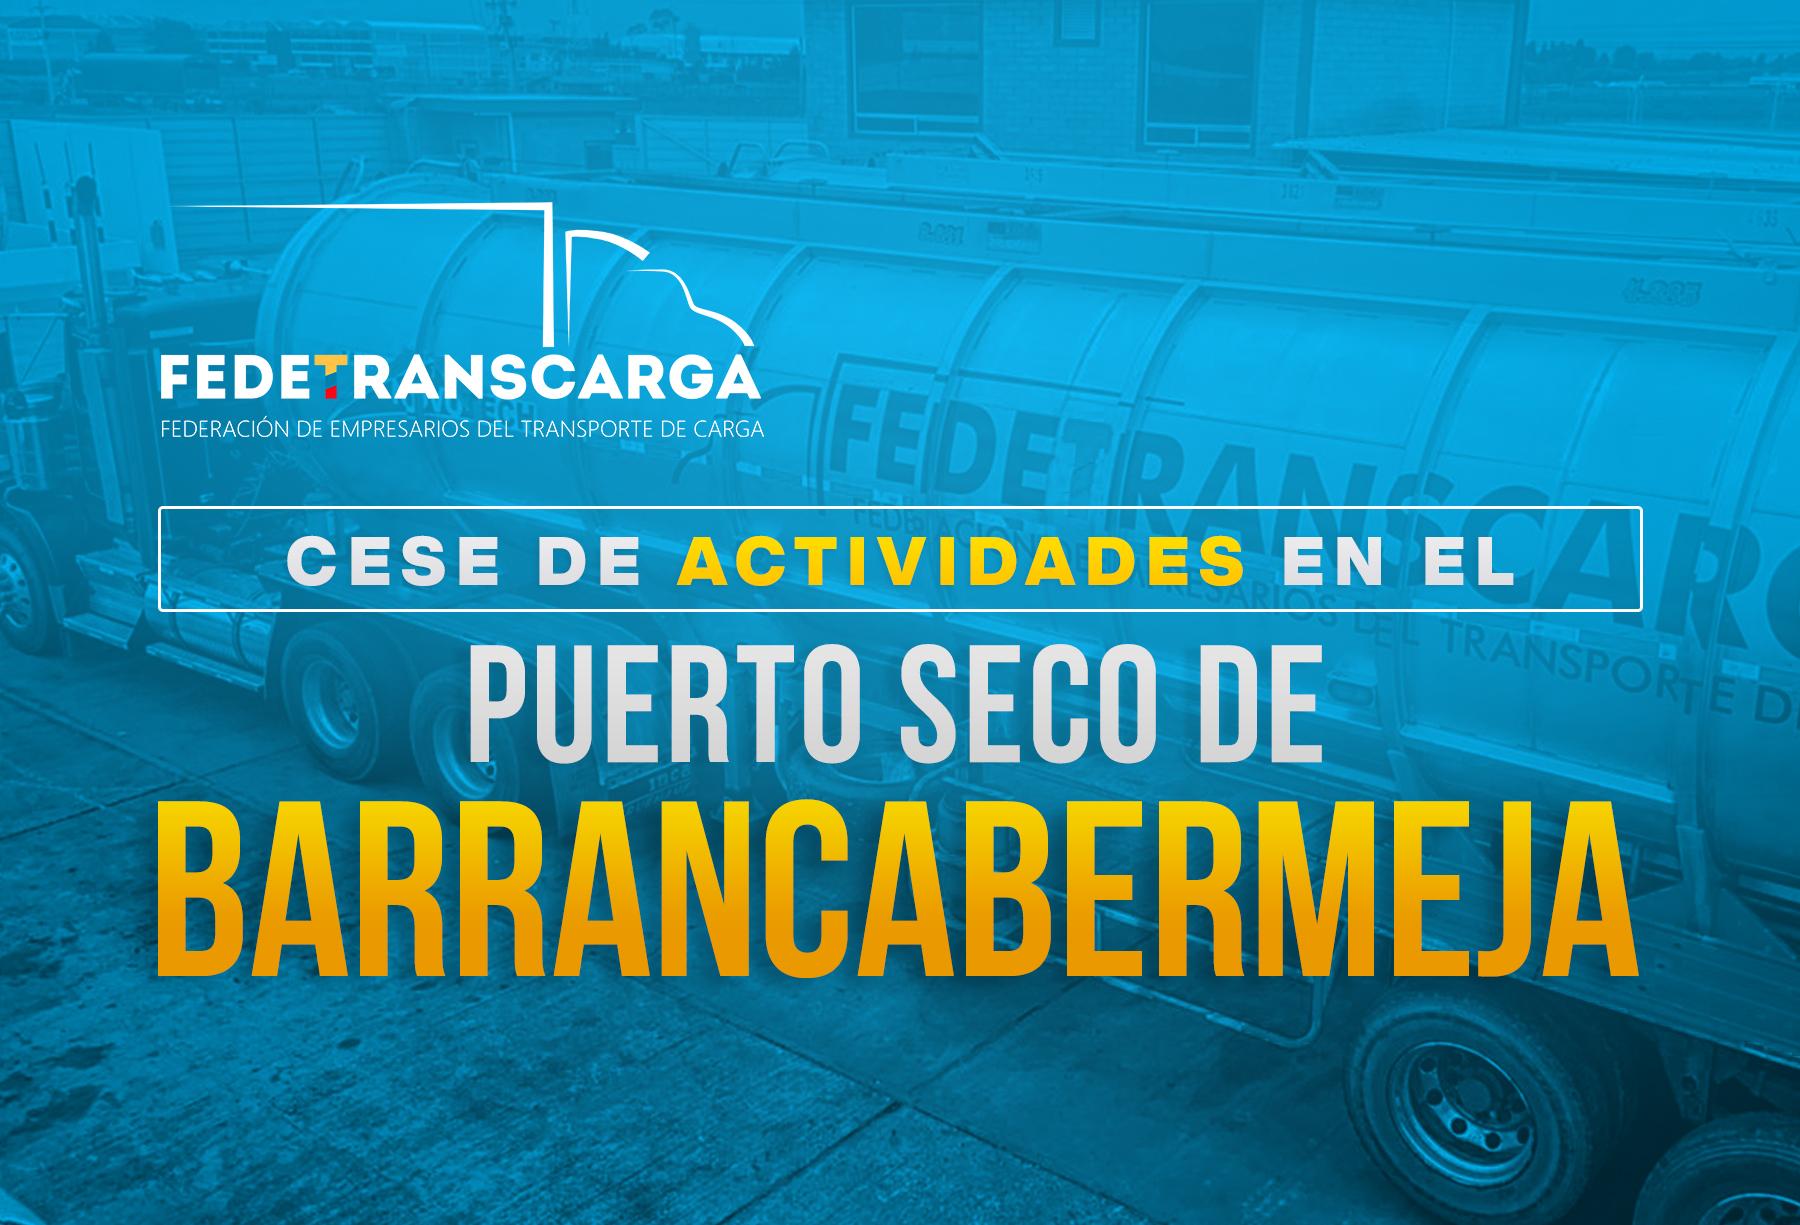 Cese de actividades en el Puerto Seco de Barrancabermeja  impacta al transporte de hidrocarburos